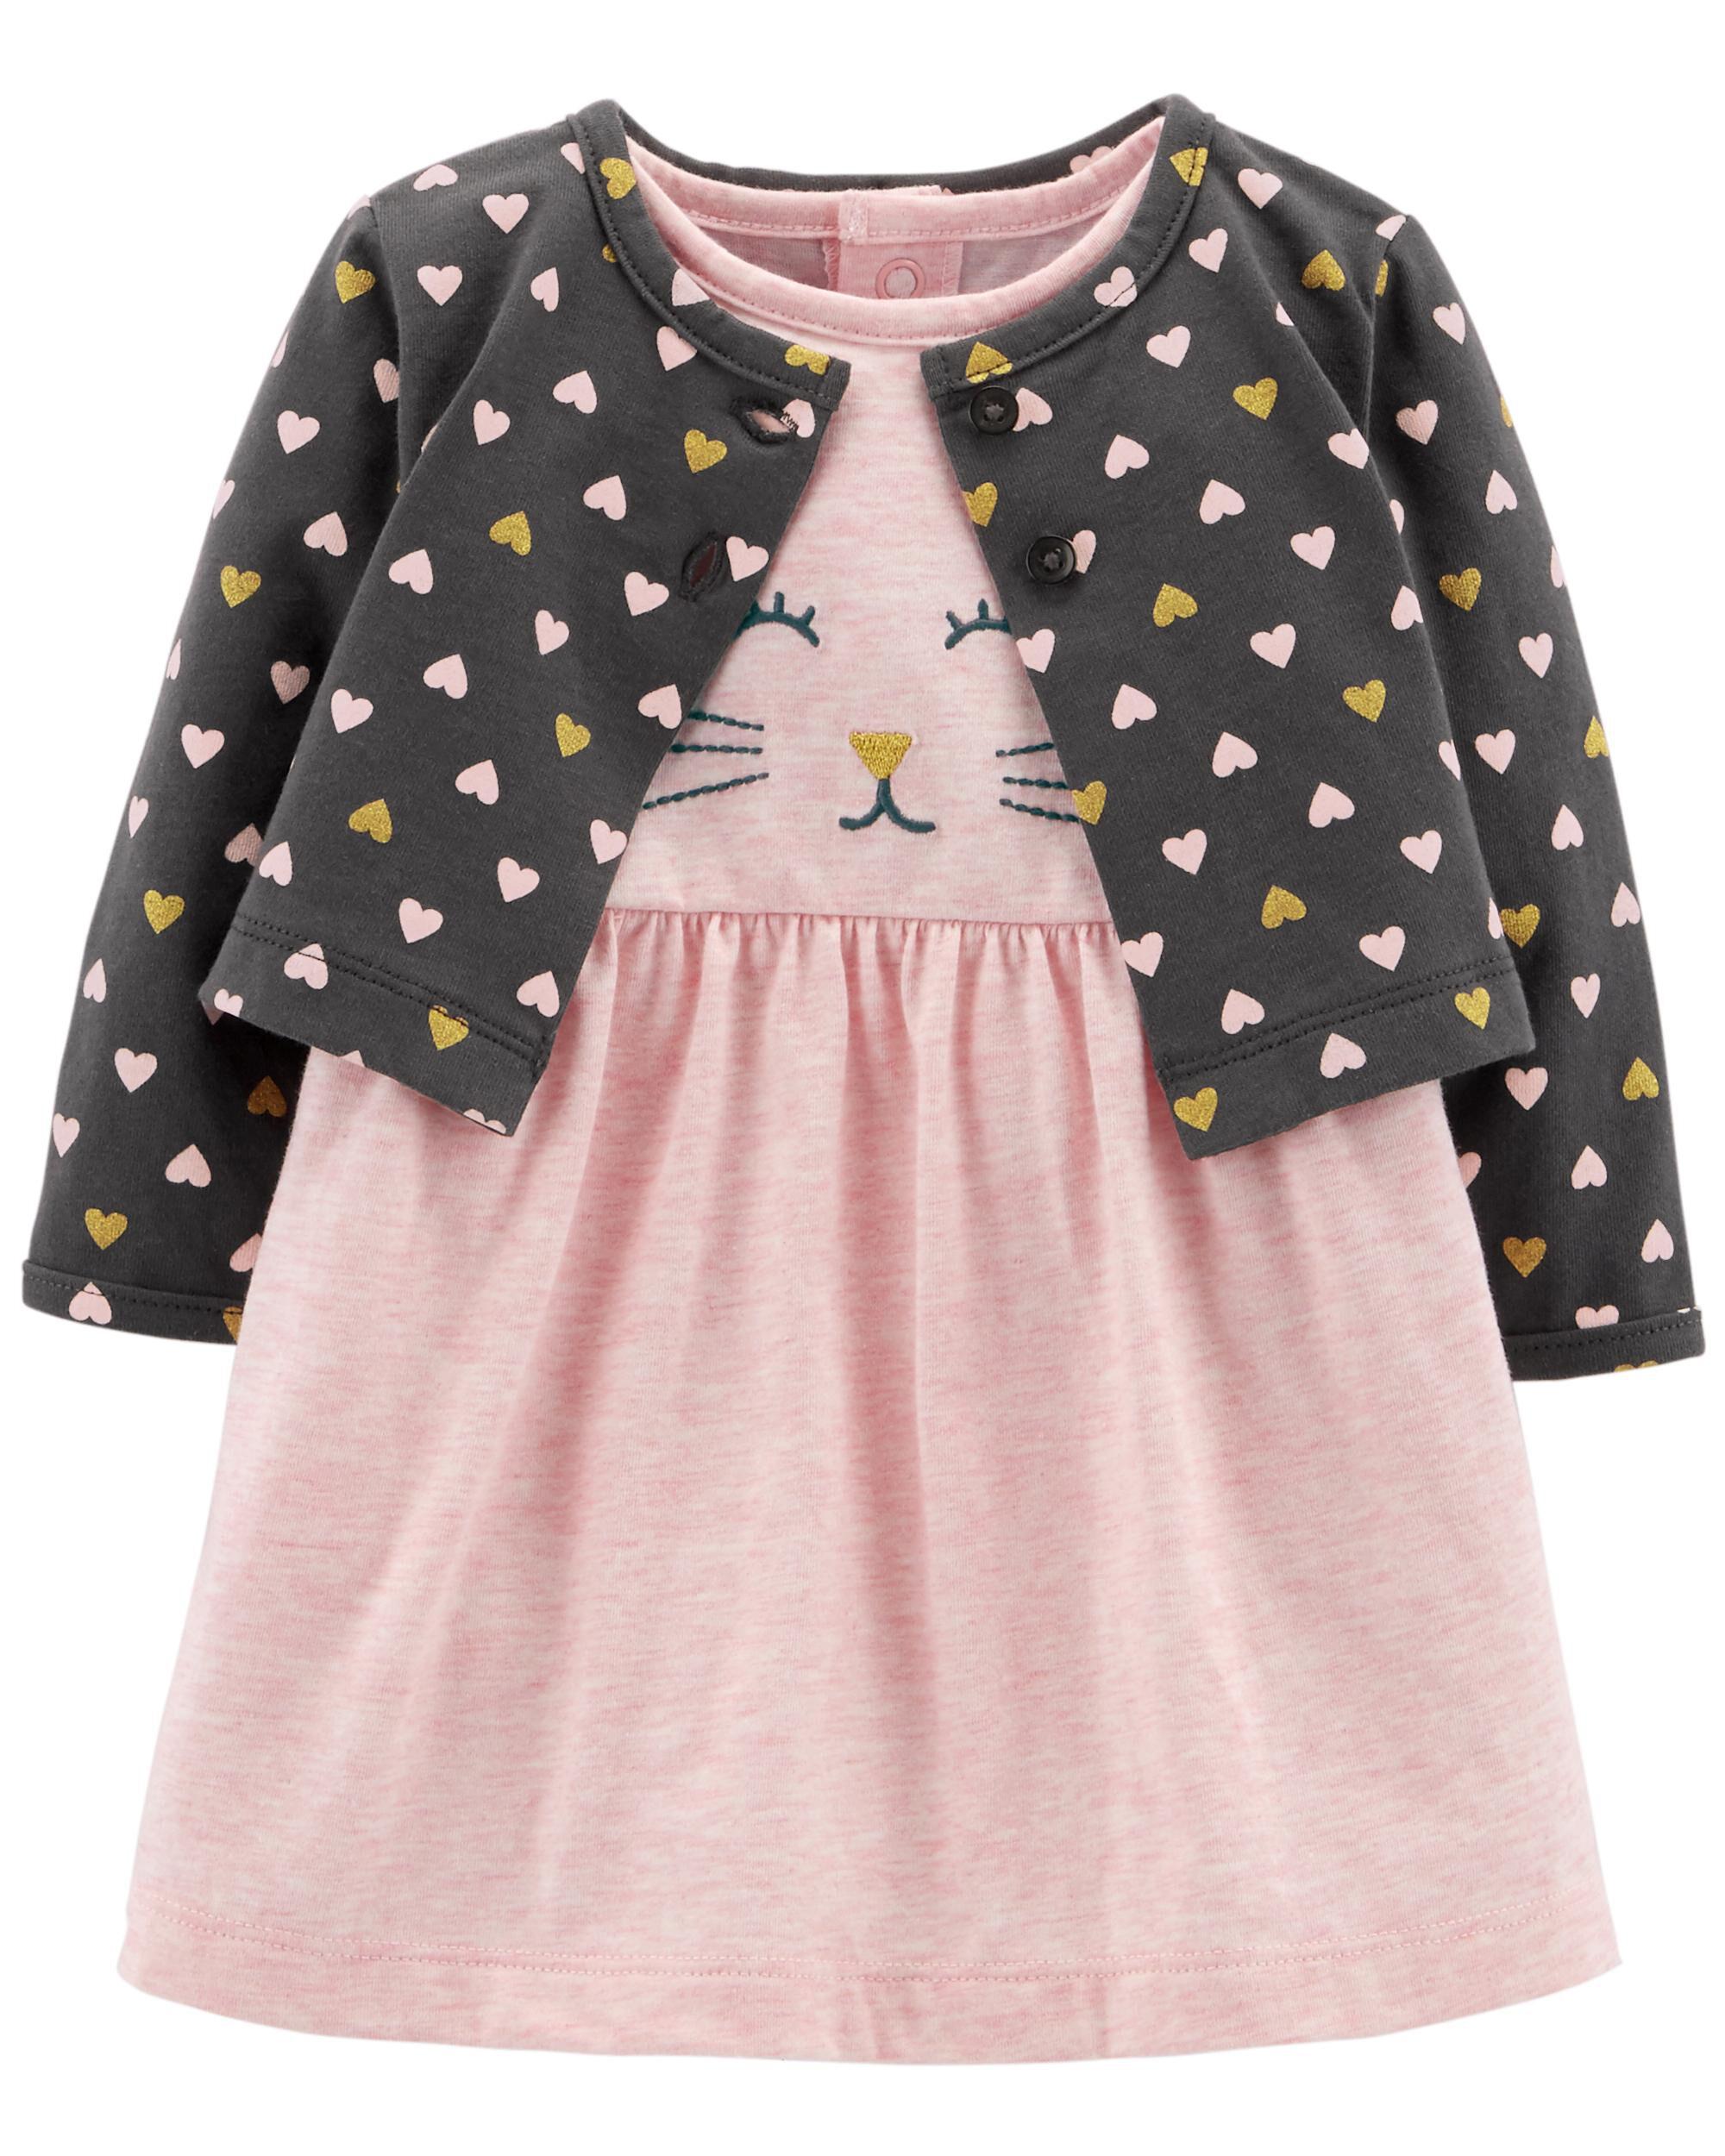 0f4a482cfd2 2-Piece Bodysuit Dress   Cardigan Set